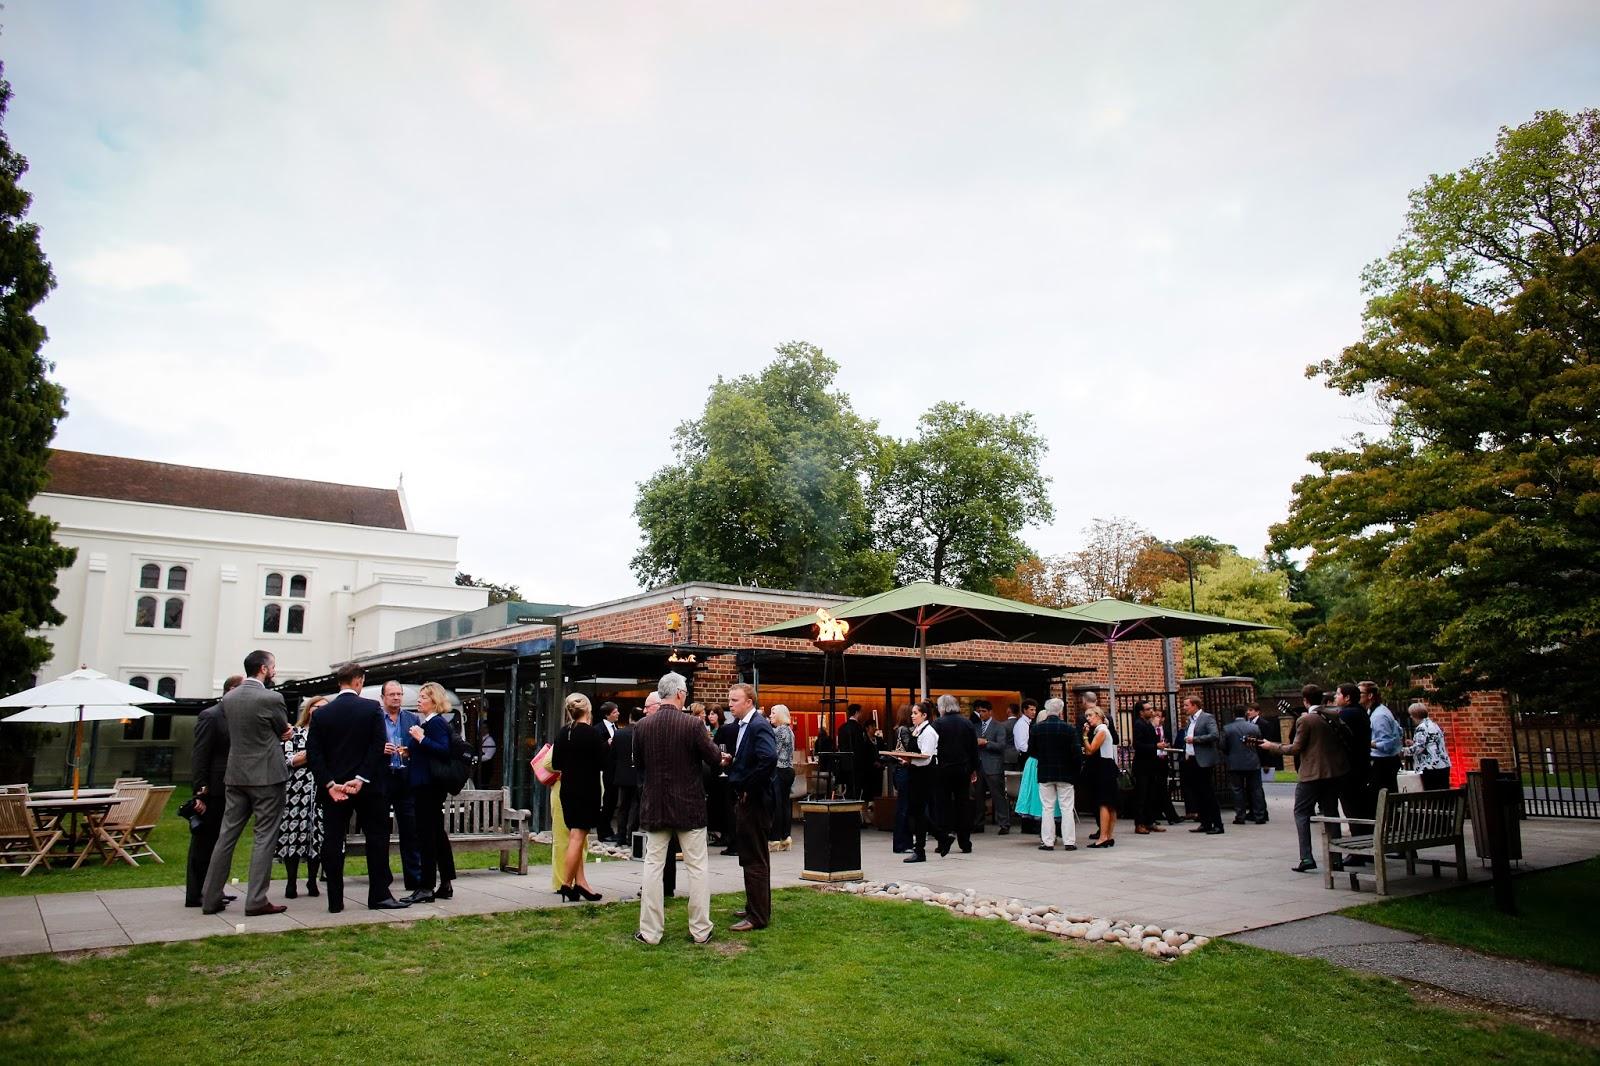 Dulwich Park Cafe Refurbishment